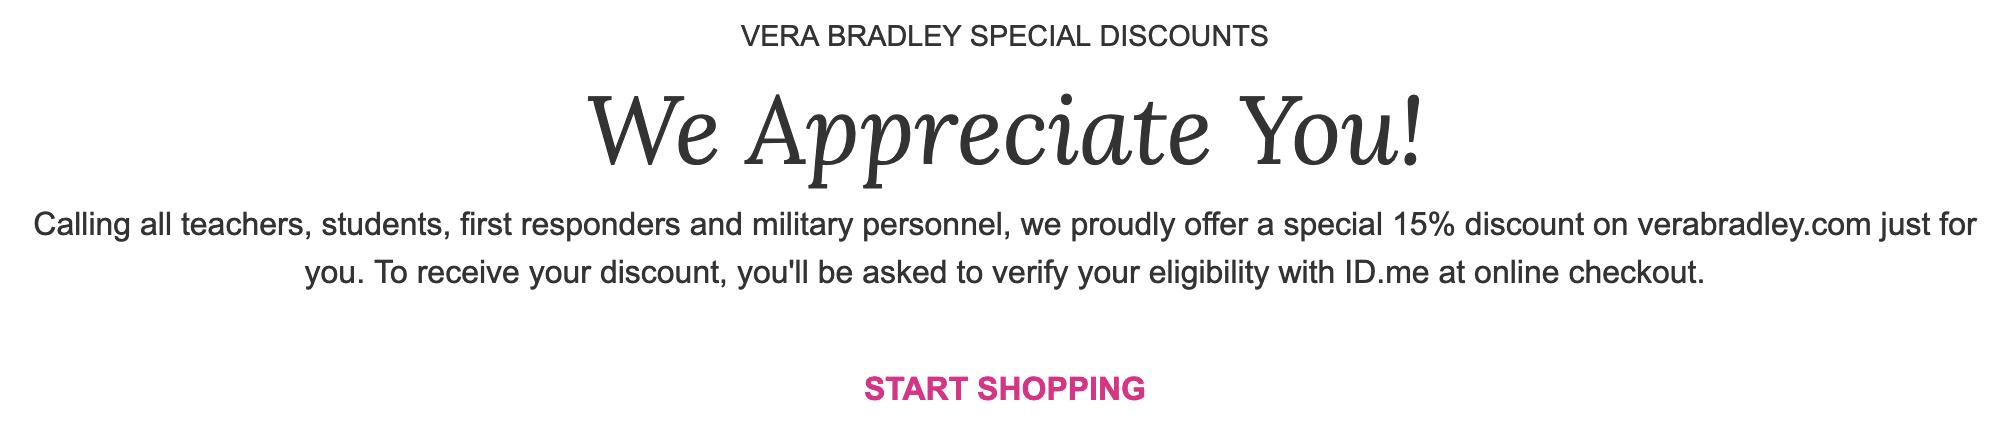 Vera Bradley Military Veteran Discounts